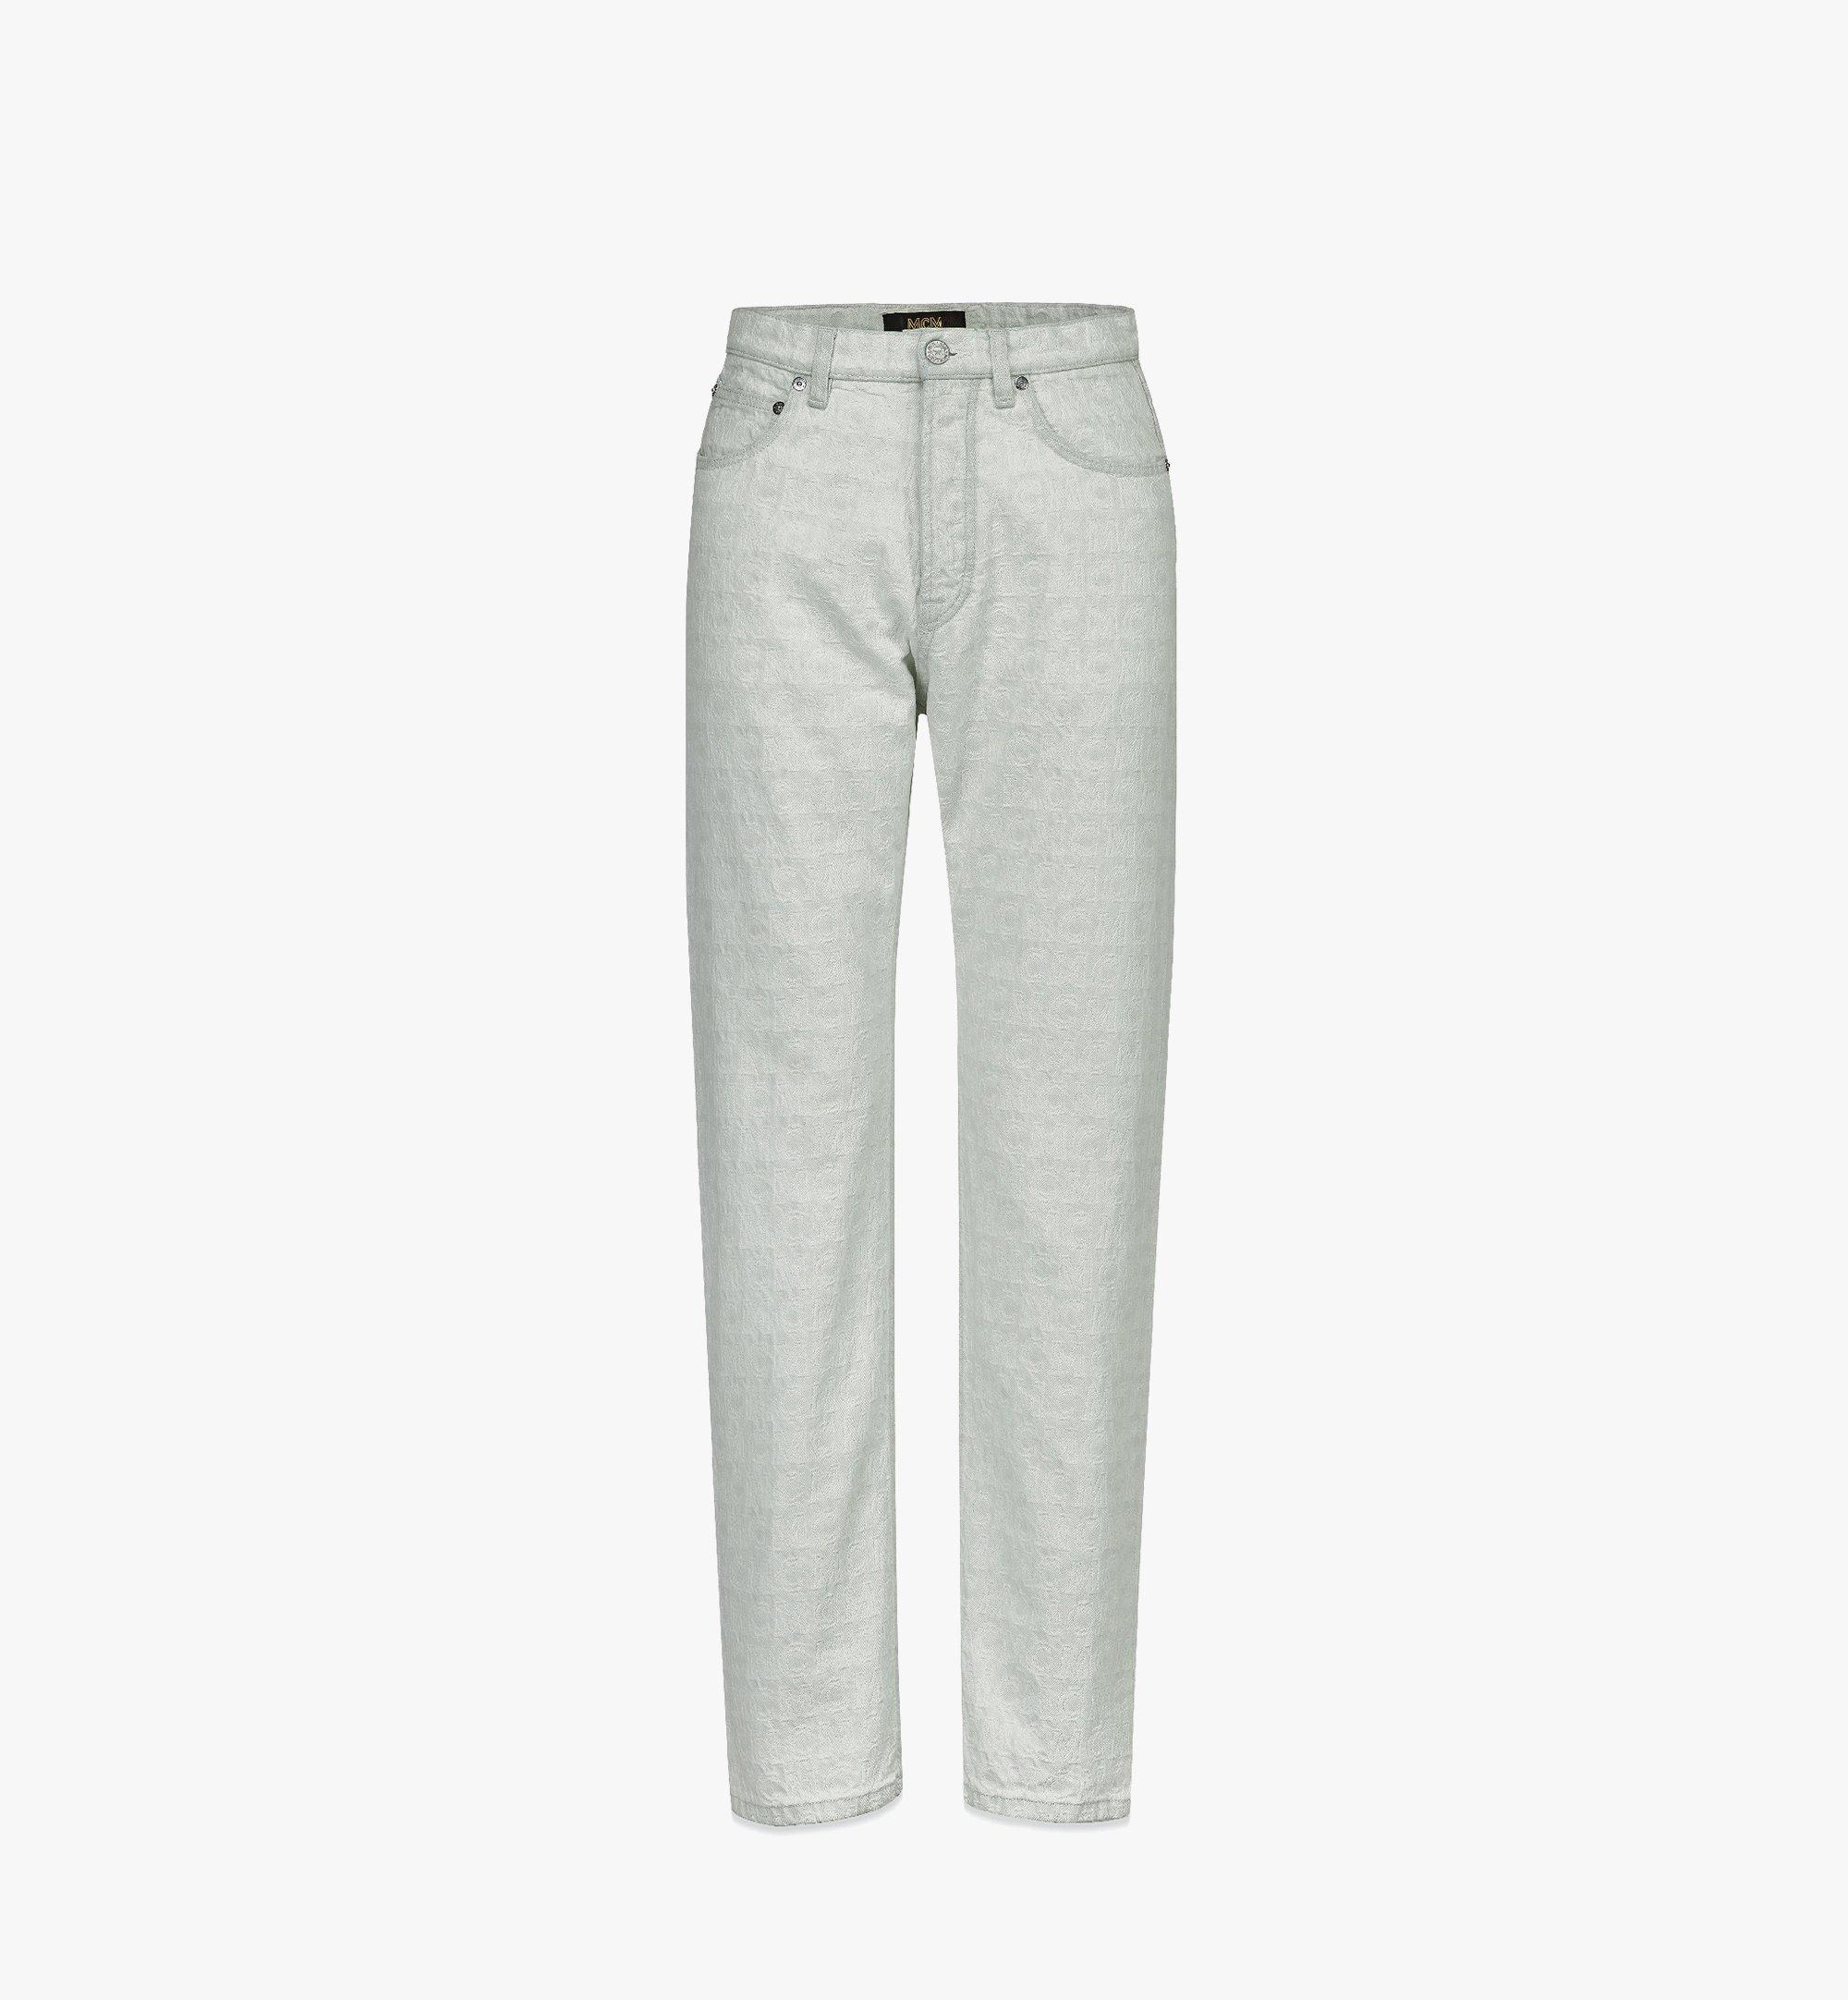 MCM 男士经典花纹直筒牛仔裤 White MHPBSMM03WO046 更多视角 1